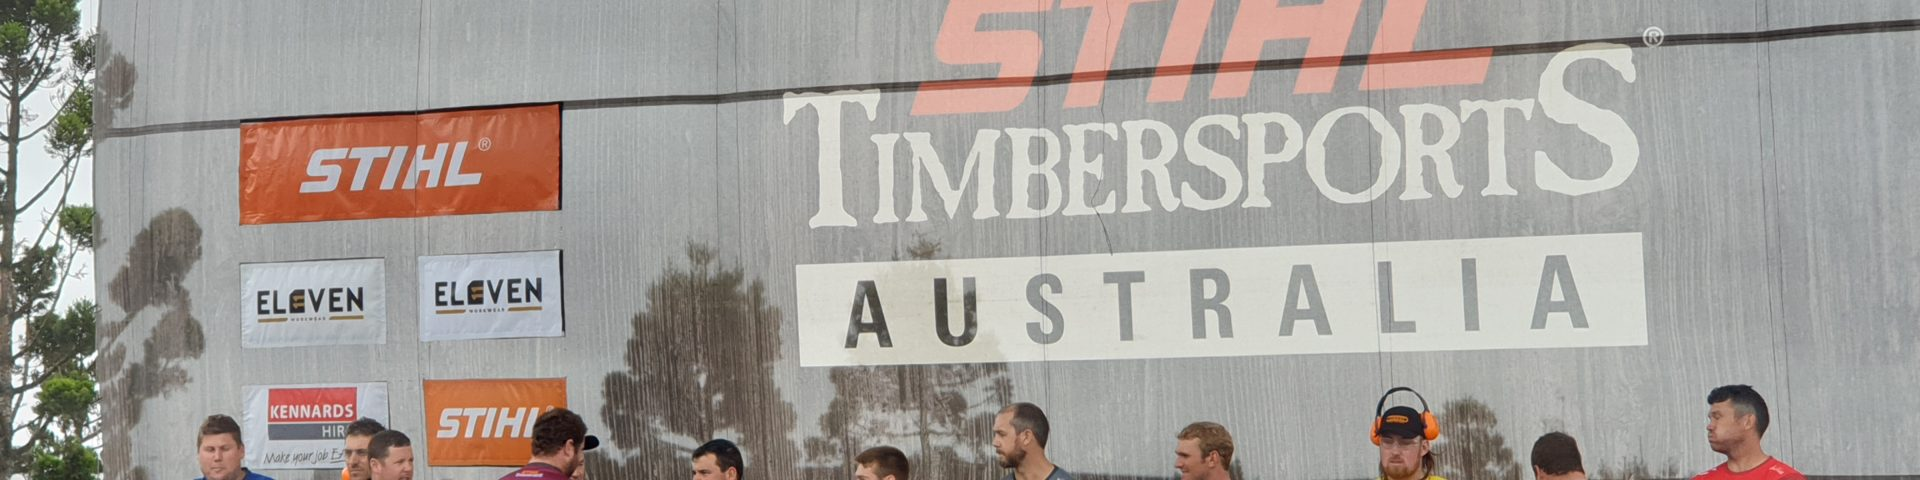 Timbersports ティンバースポーツ